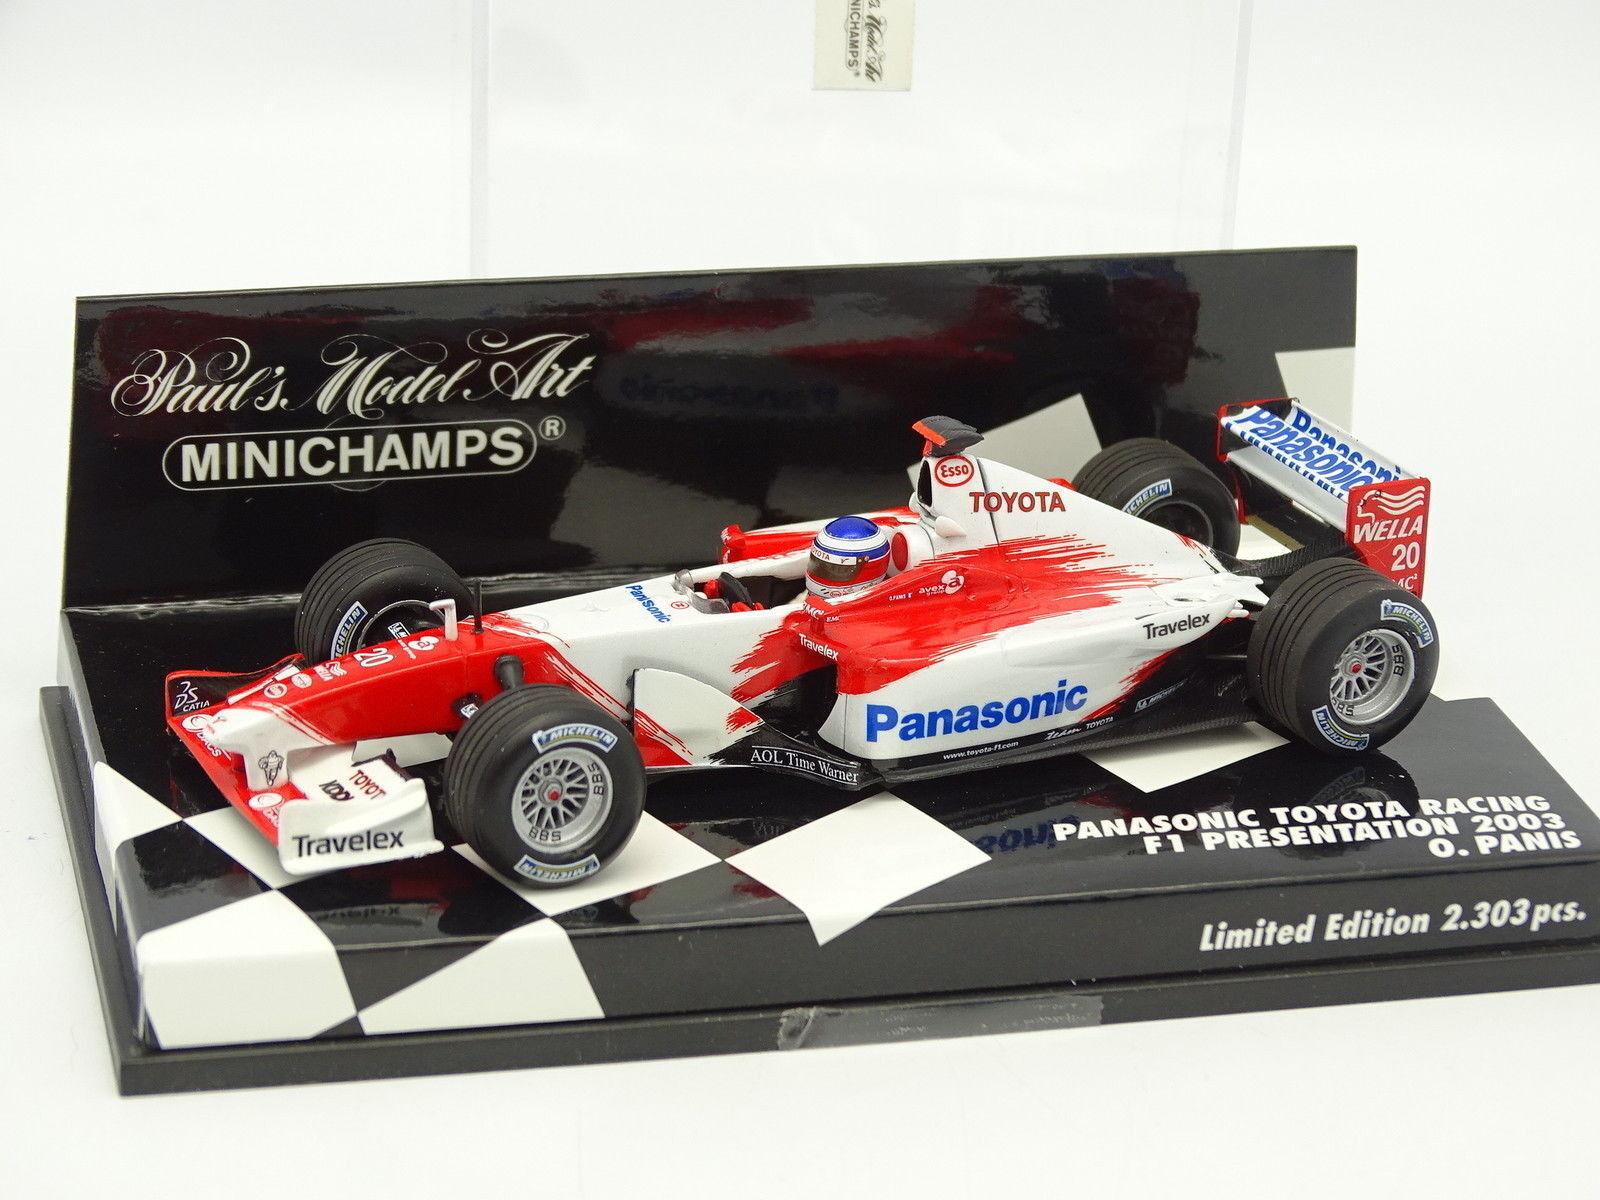 Minichamps 1 43 - F1 Panasonic Toyota Racing Presentation 2003 Panis